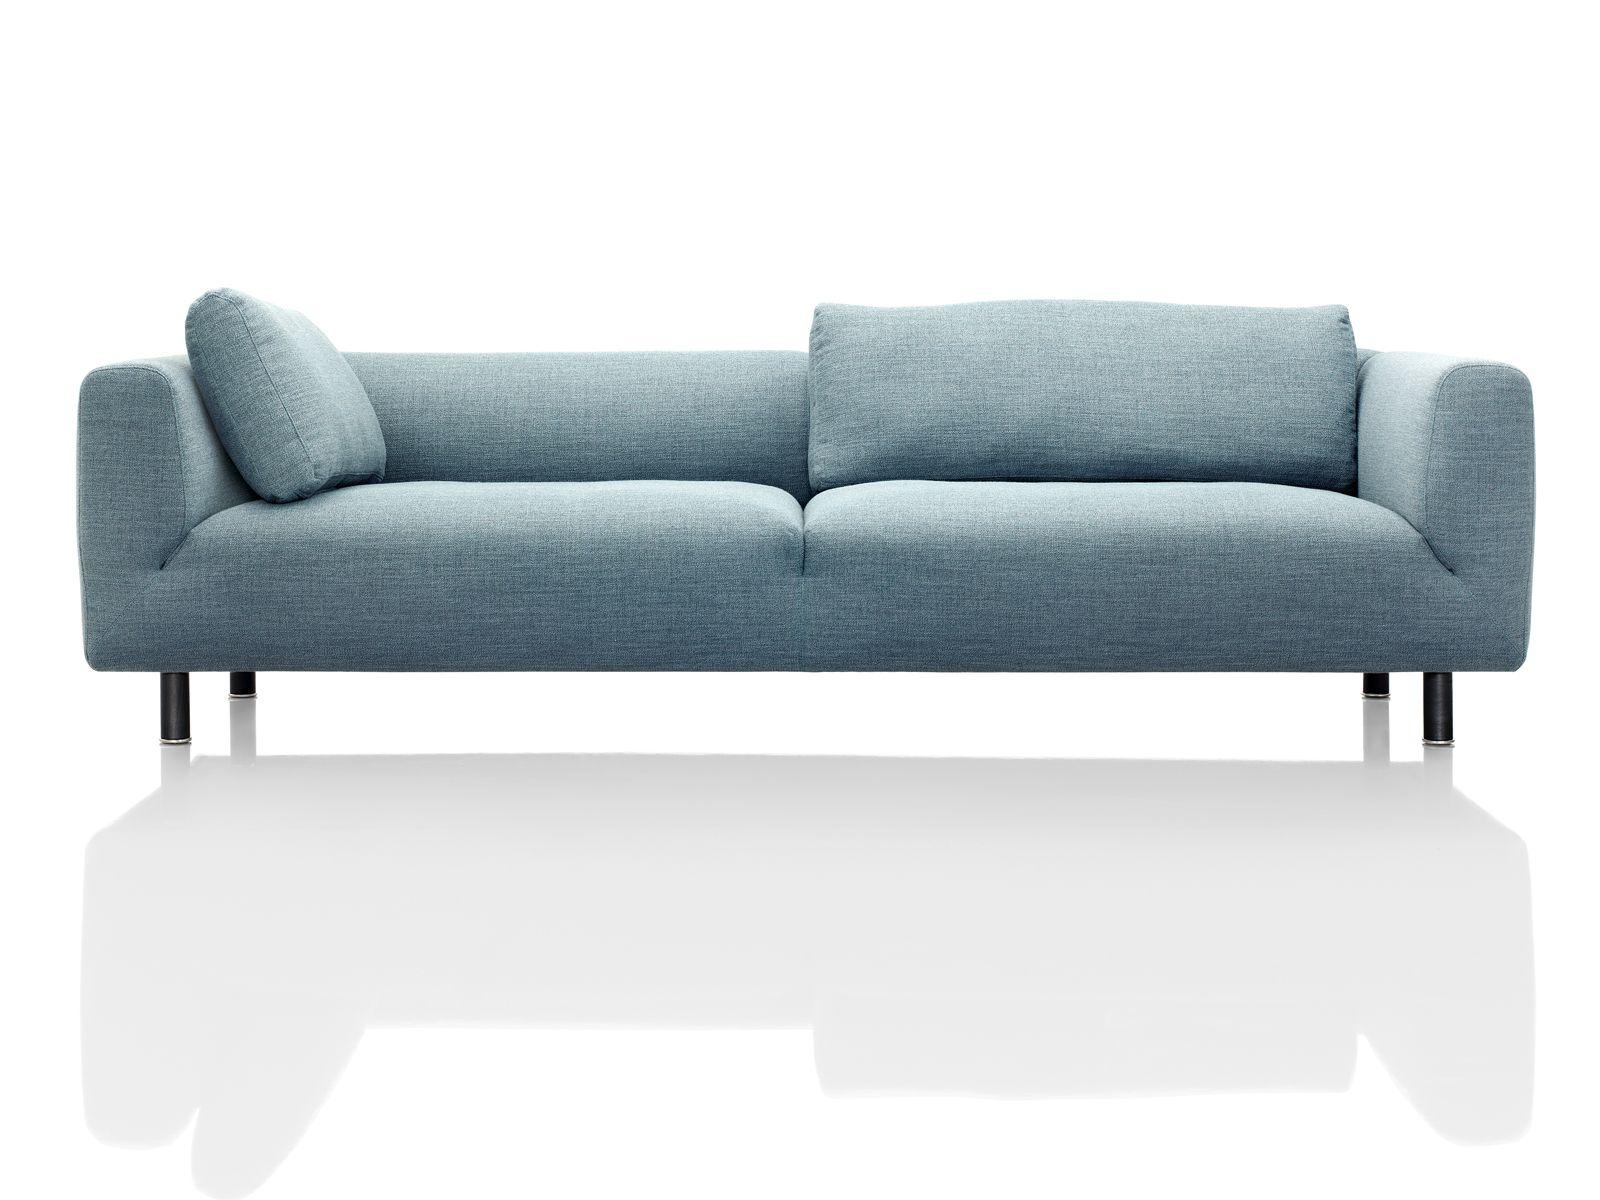 ardea sofa by wittmann design paolo piva. Black Bedroom Furniture Sets. Home Design Ideas